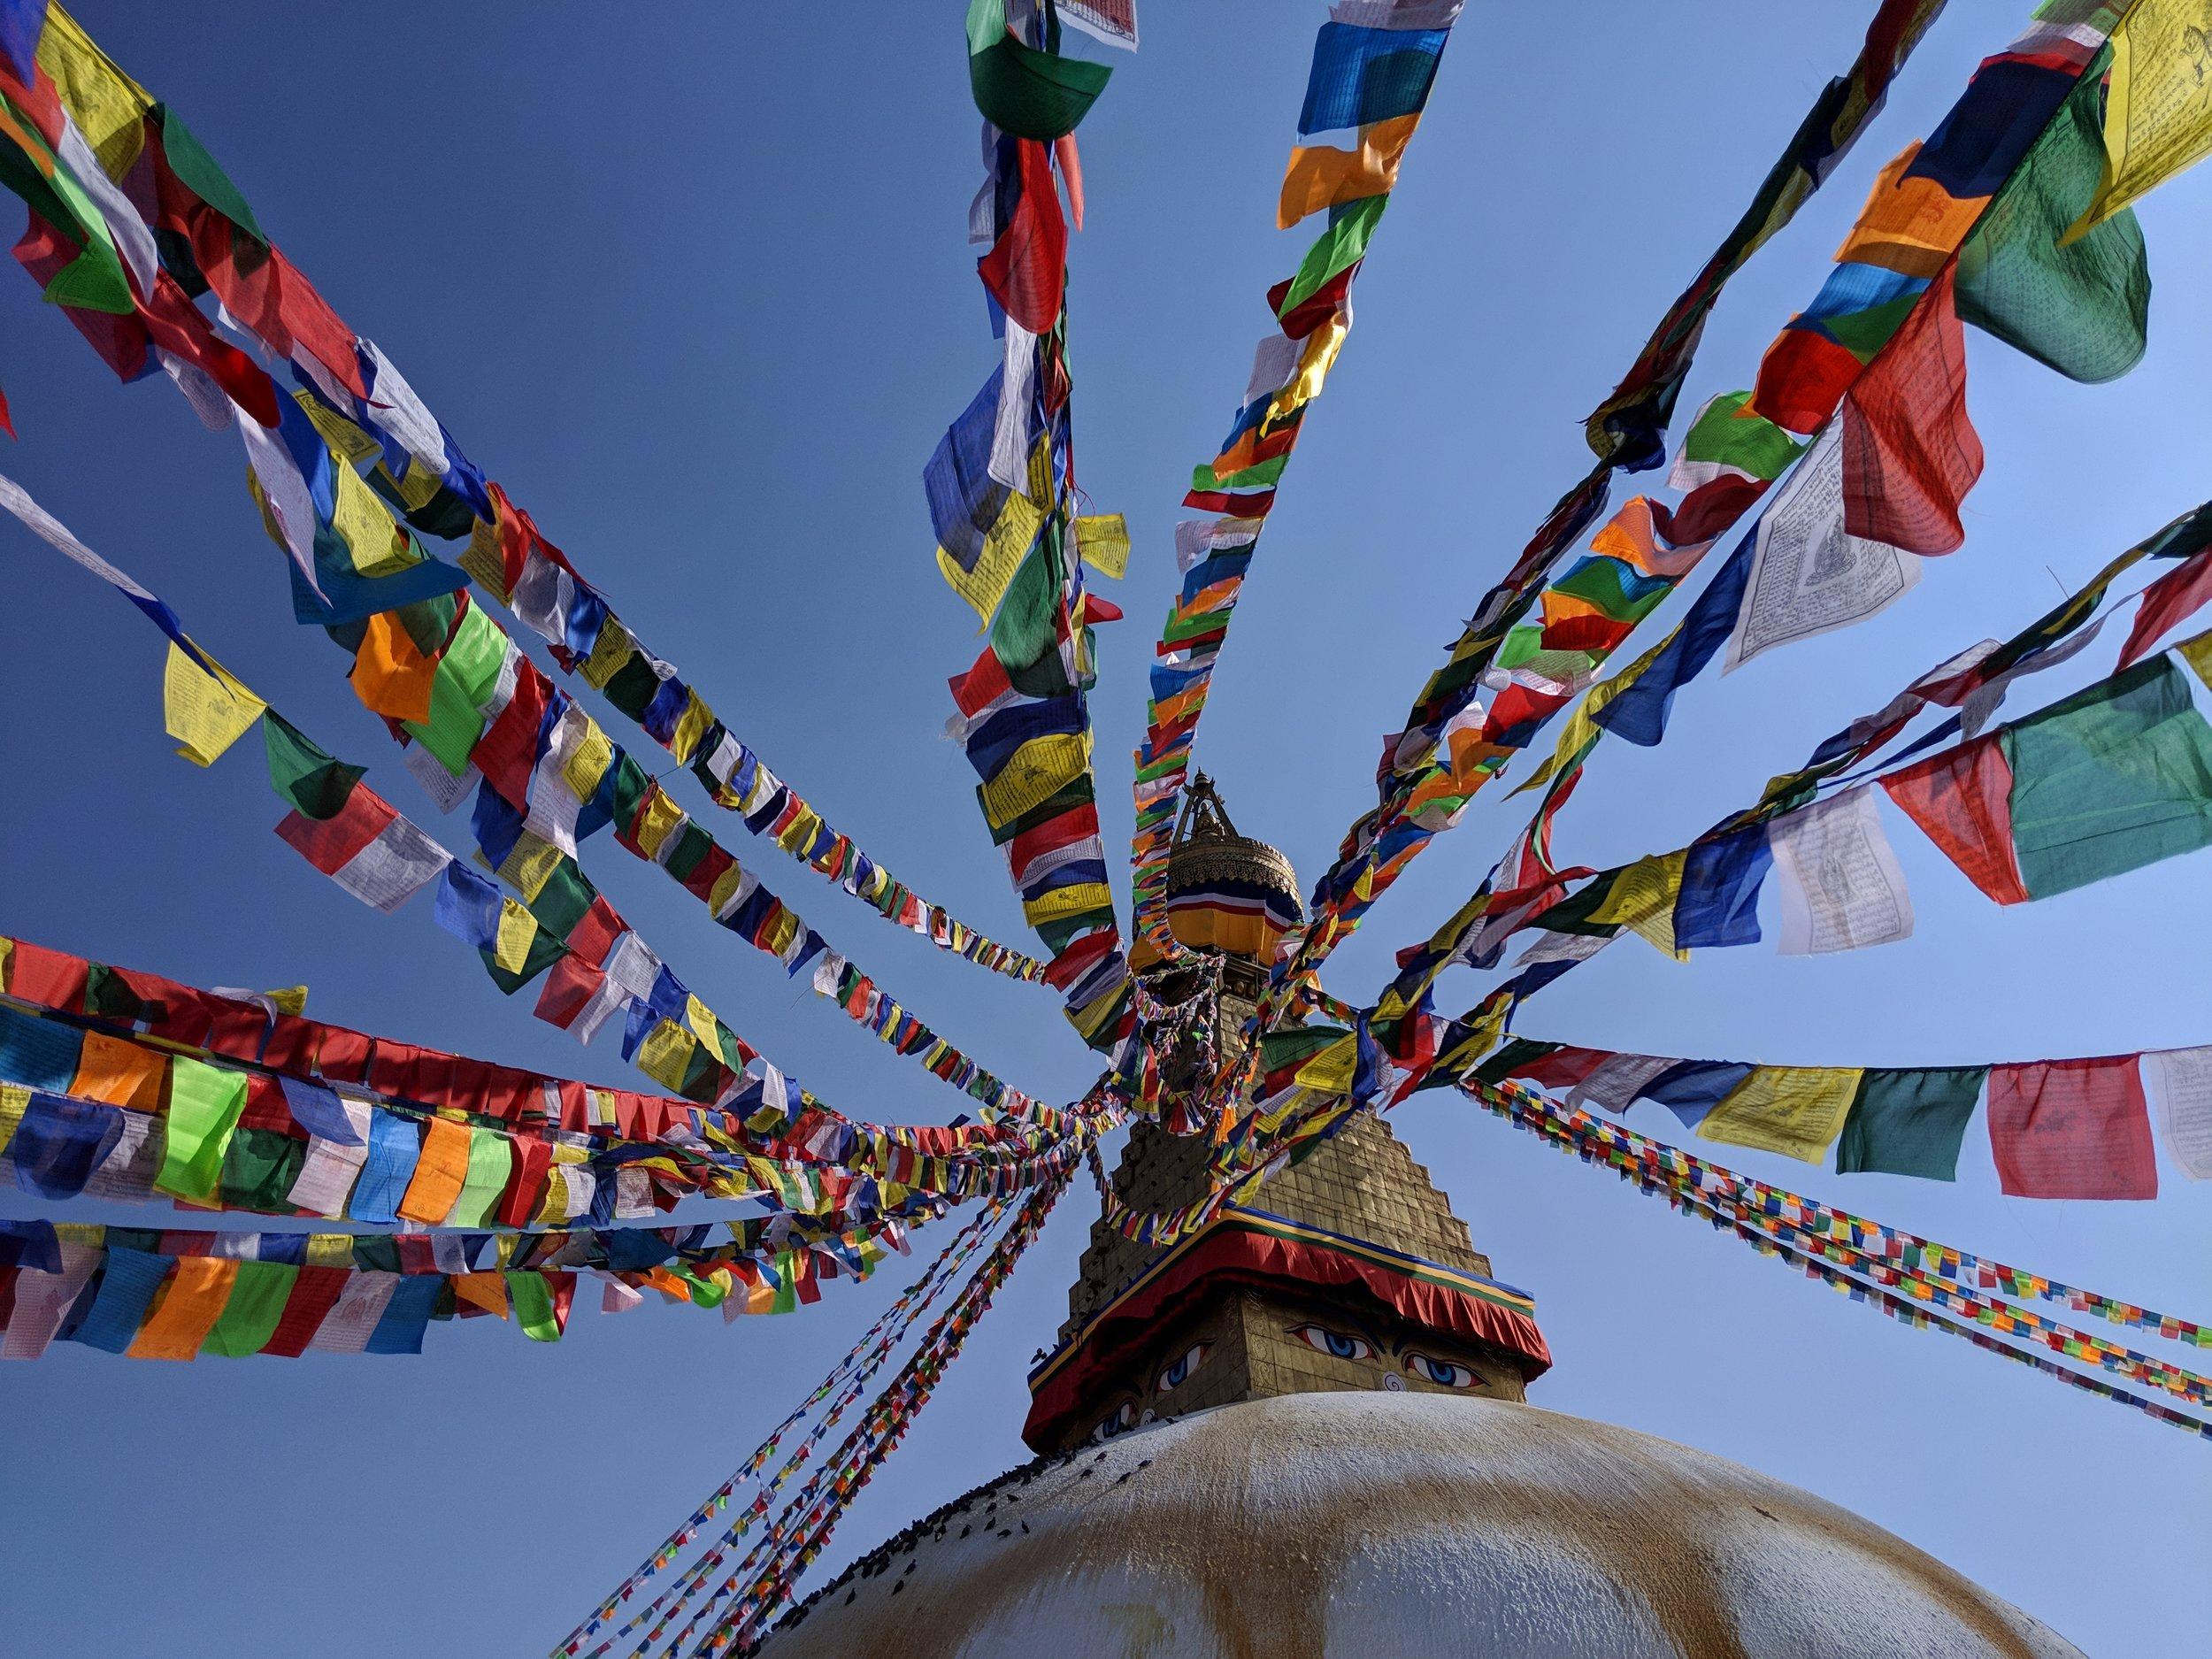 Walking around the Bouddhanath Stupa in Kathmandu was really relaxing